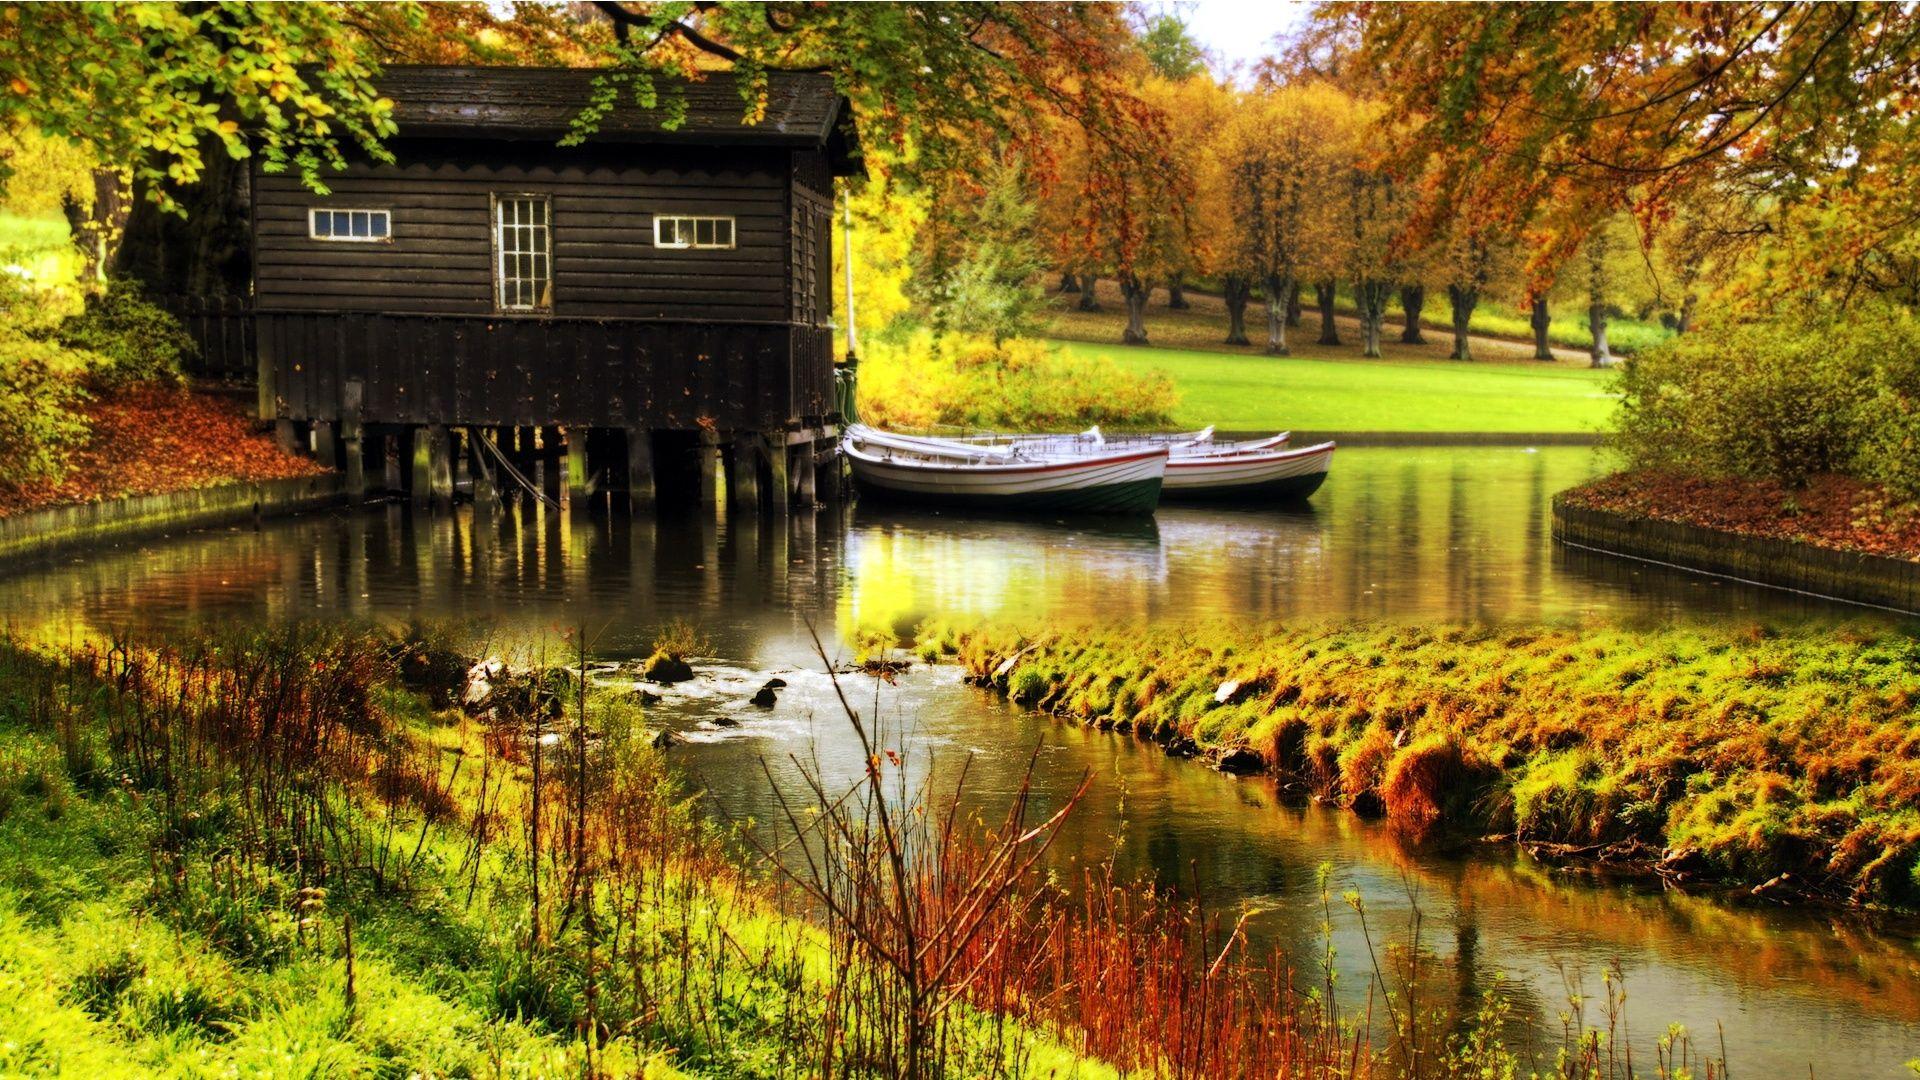 Download Nature Wallpapers Full HD 1080p Photo Desktop Backgrounds 1920x1080